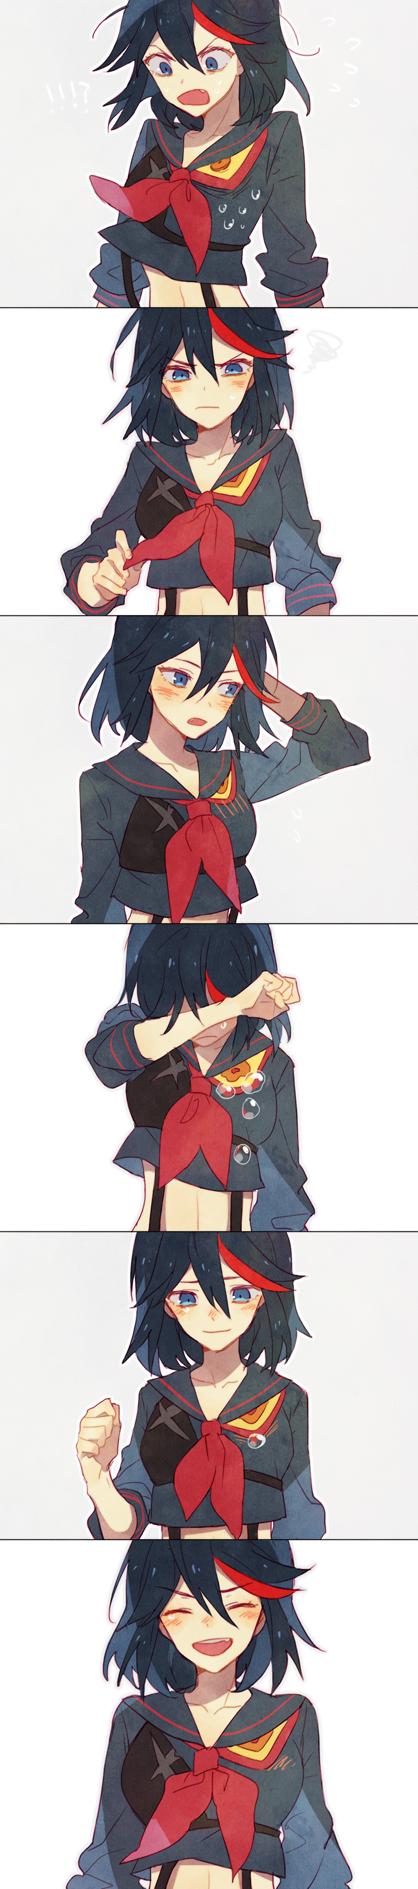 Tags: Anime, You (Roka), KILL la KILL, Matoi Ryuuko, Fanart From Pixiv, PNG Conversion, Pixiv, Fanart, Ryuuko Matoi